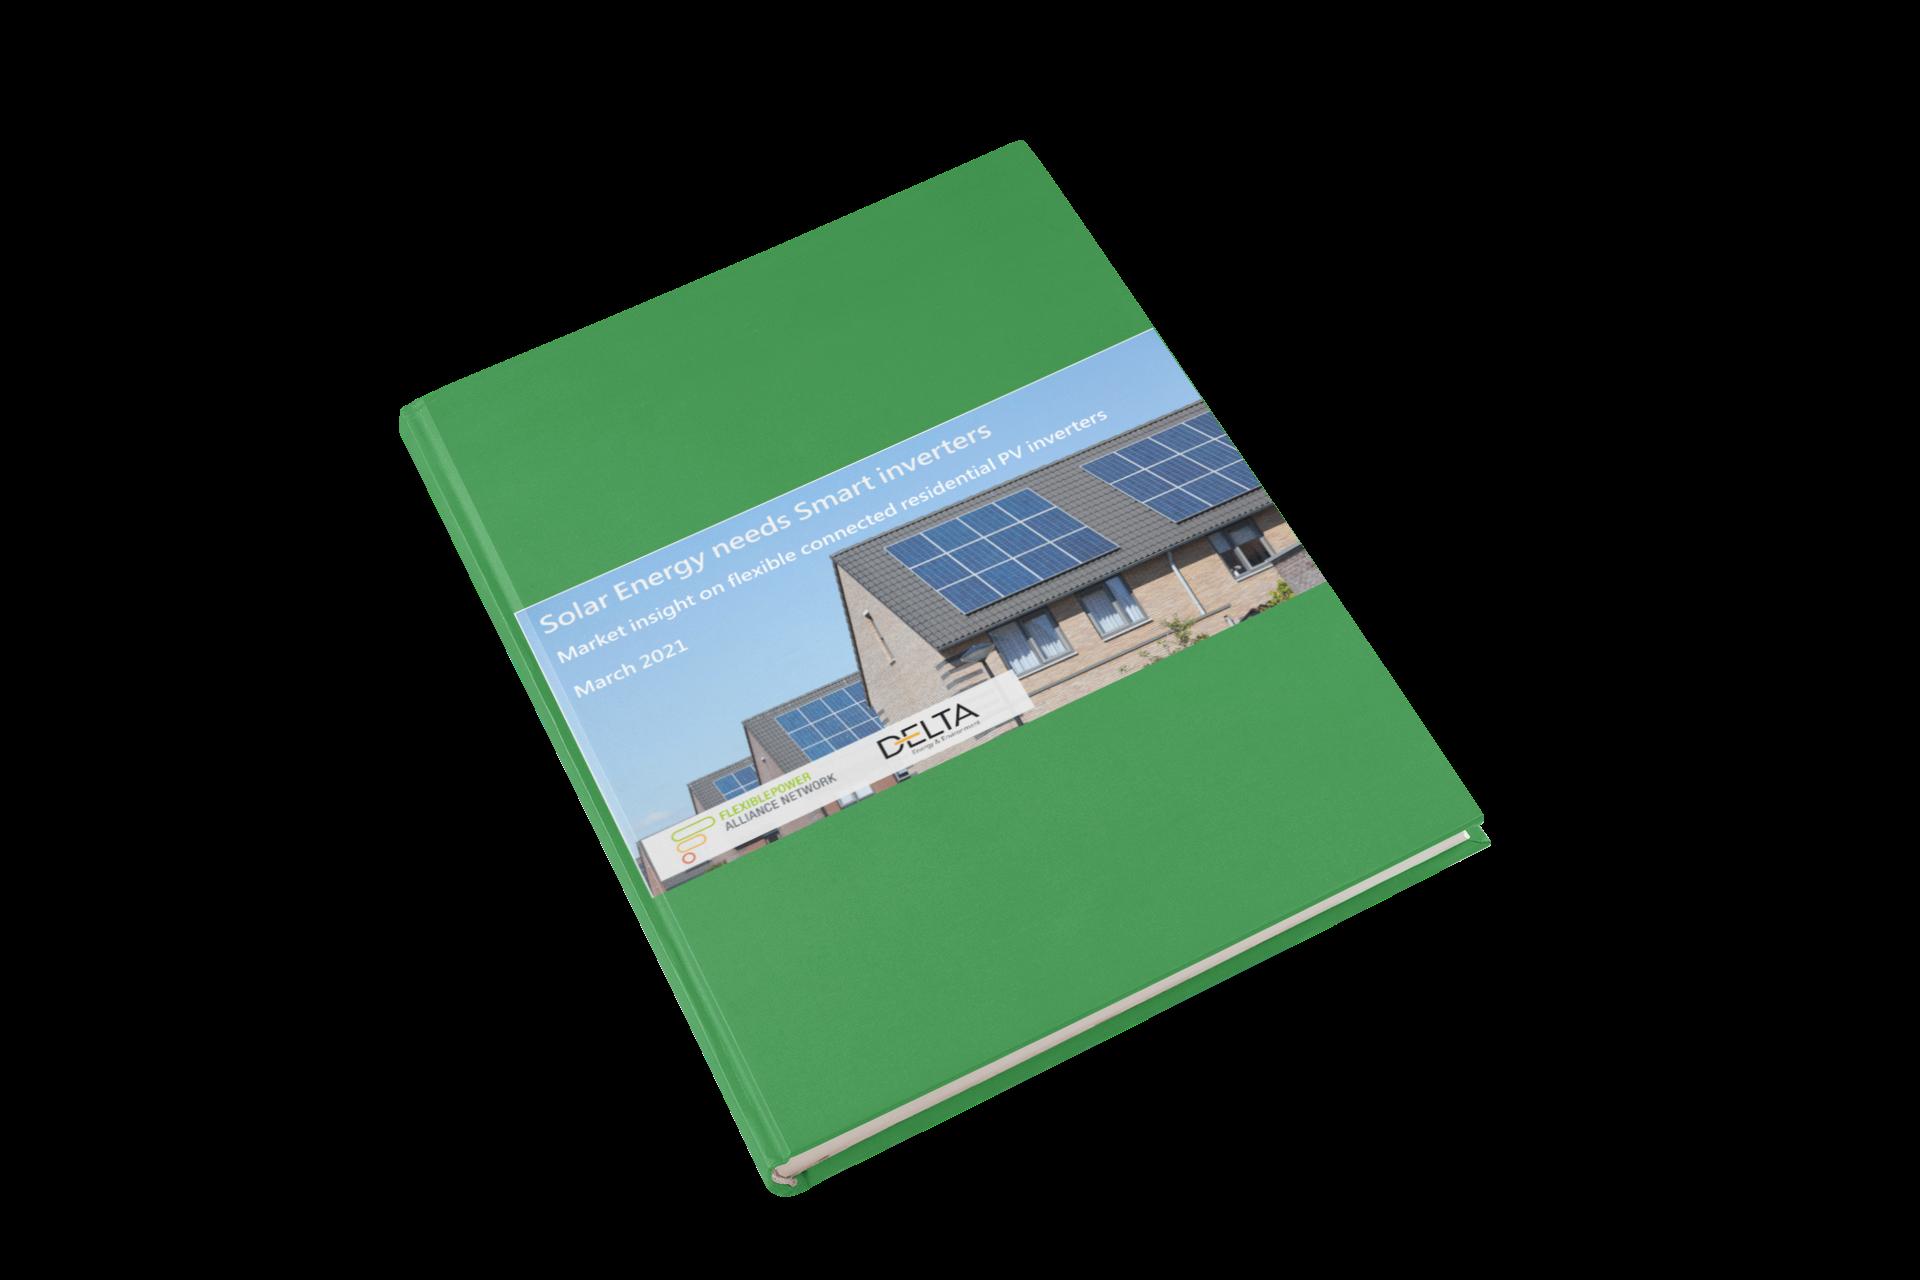 Summary of flex monitor: Solar Energy needs smart inverters